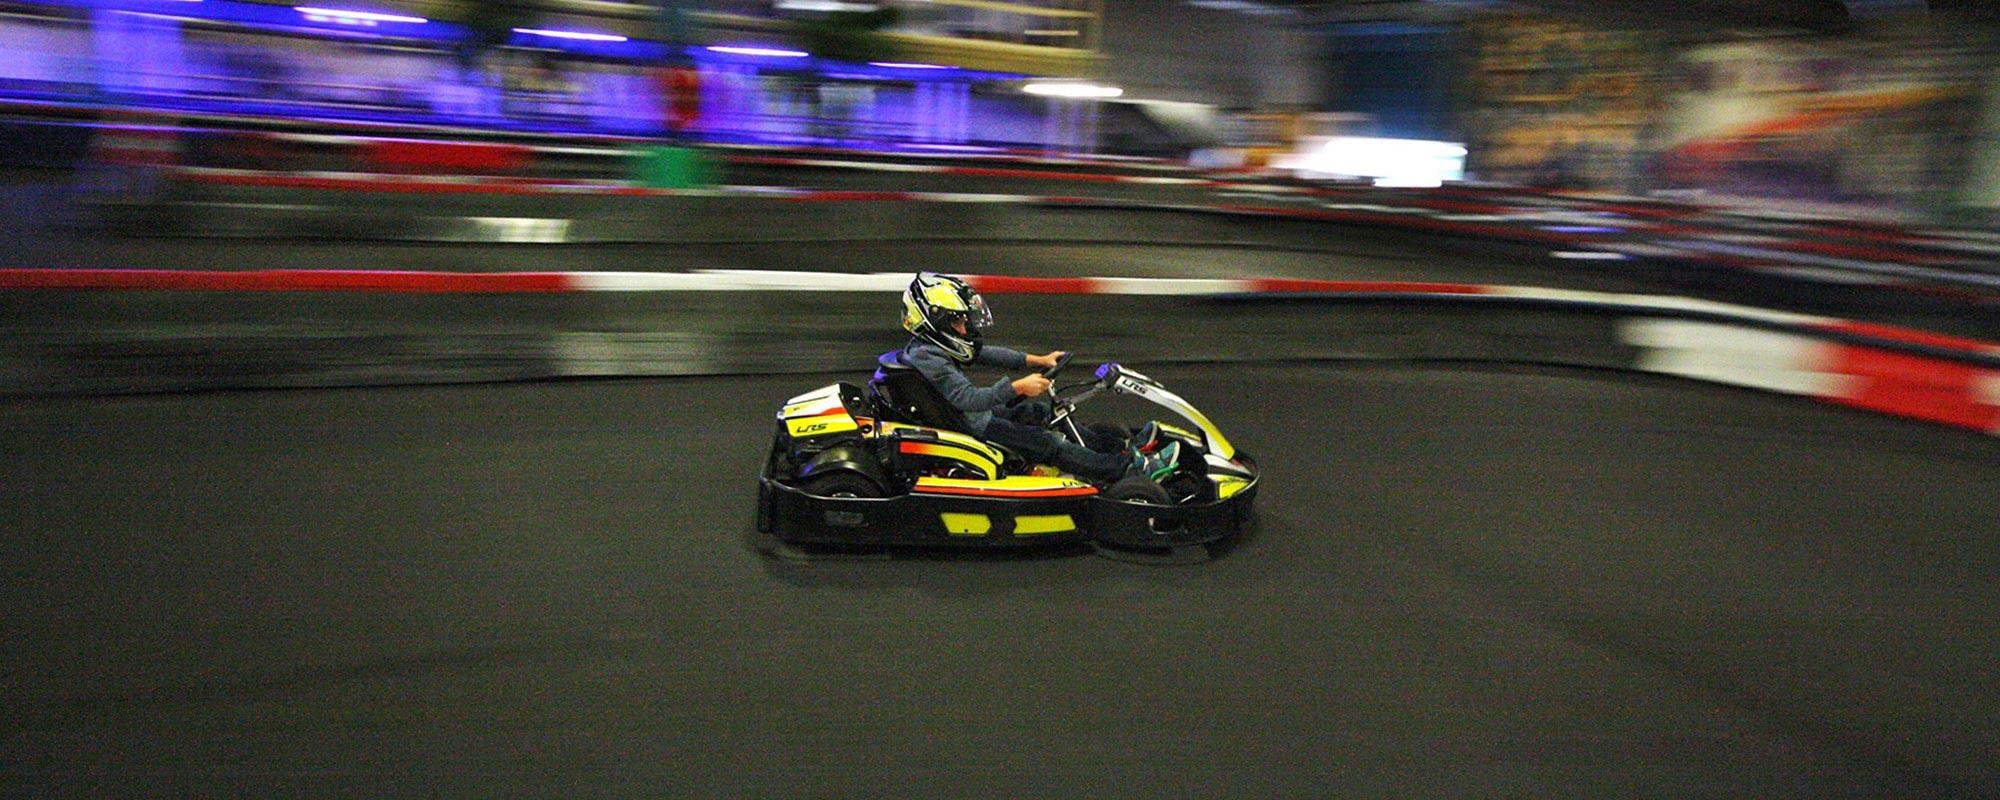 ebafkc-juniorkarting-2000x800-04